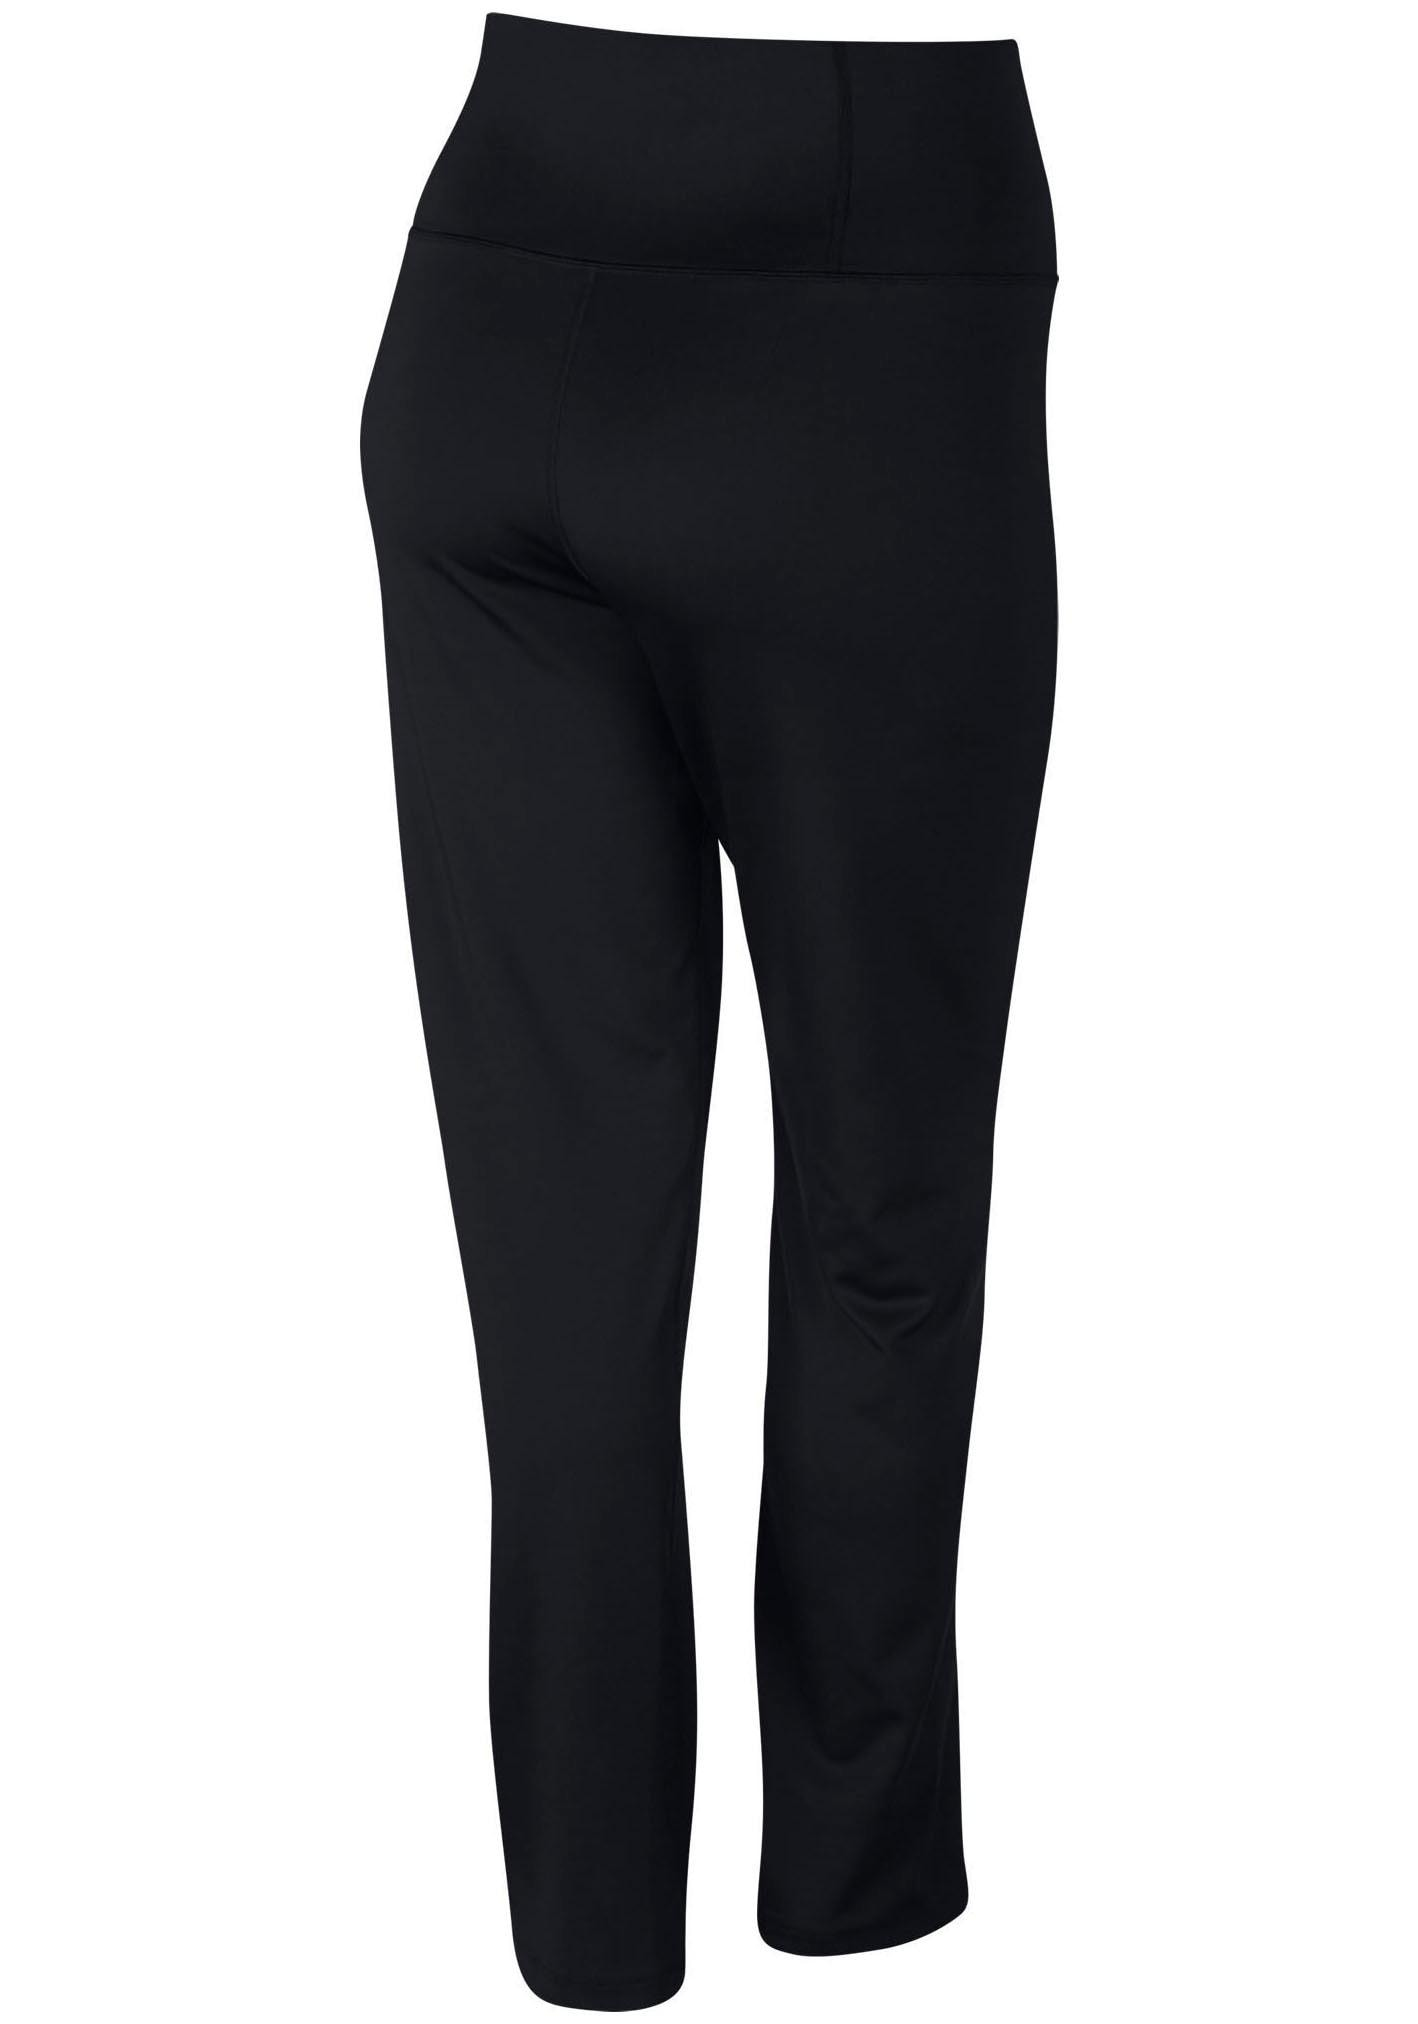 Nike Trainingshose WO´MEN NIKE POWER CLASSIC GYM PANT PLUS SIZE | Sportbekleidung > Sporthosen > Trainingshosen | Schwarz | Nike